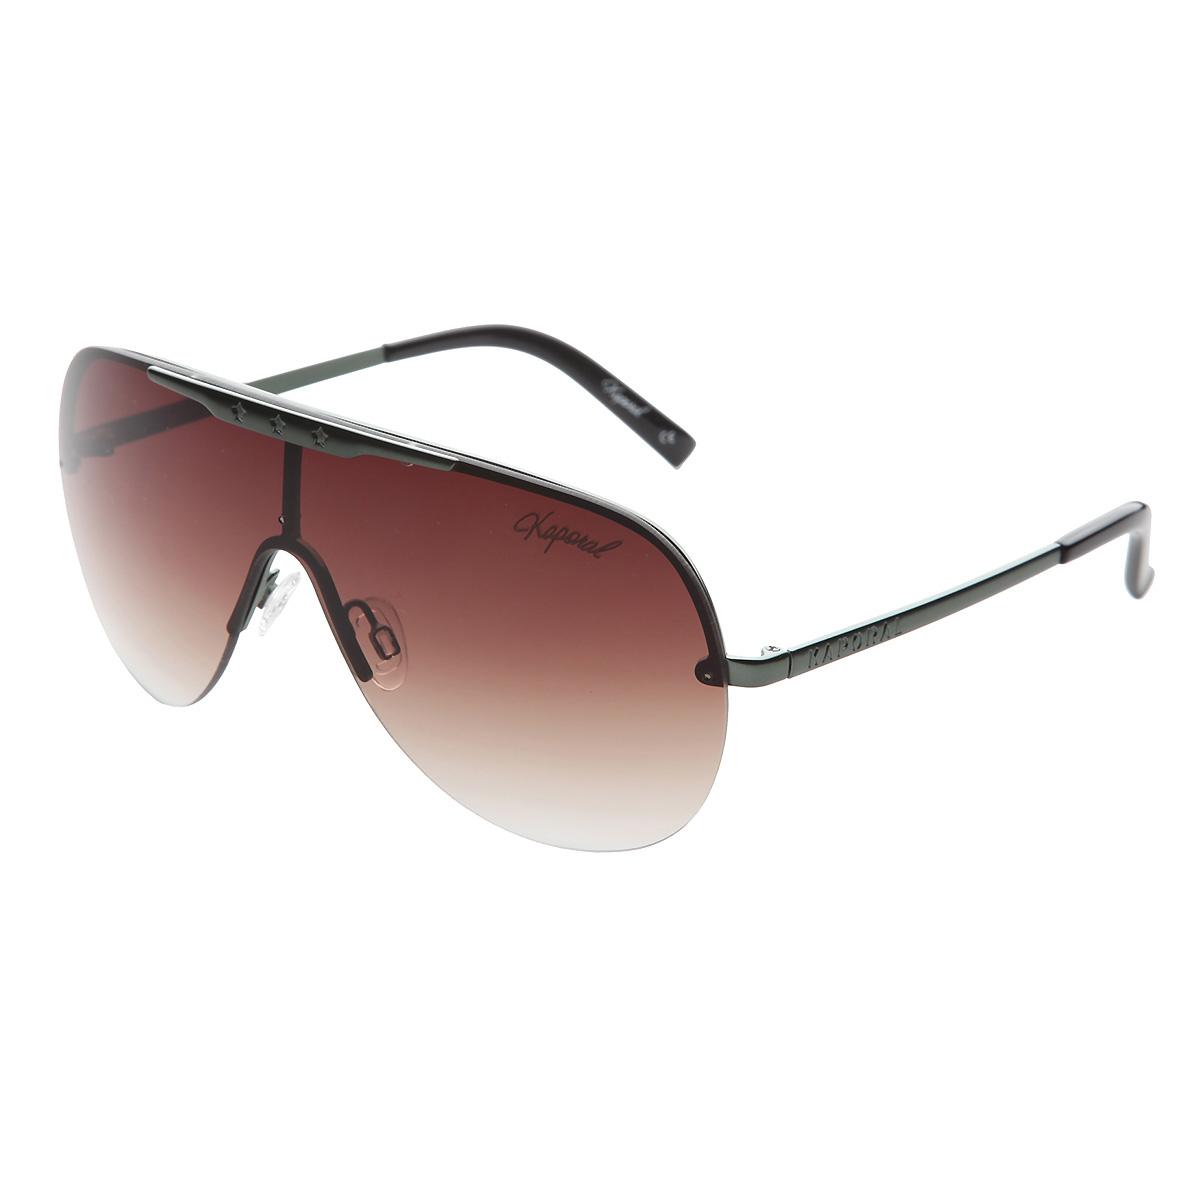 Kaporal Sonnenbrillen C02 White NpGcca